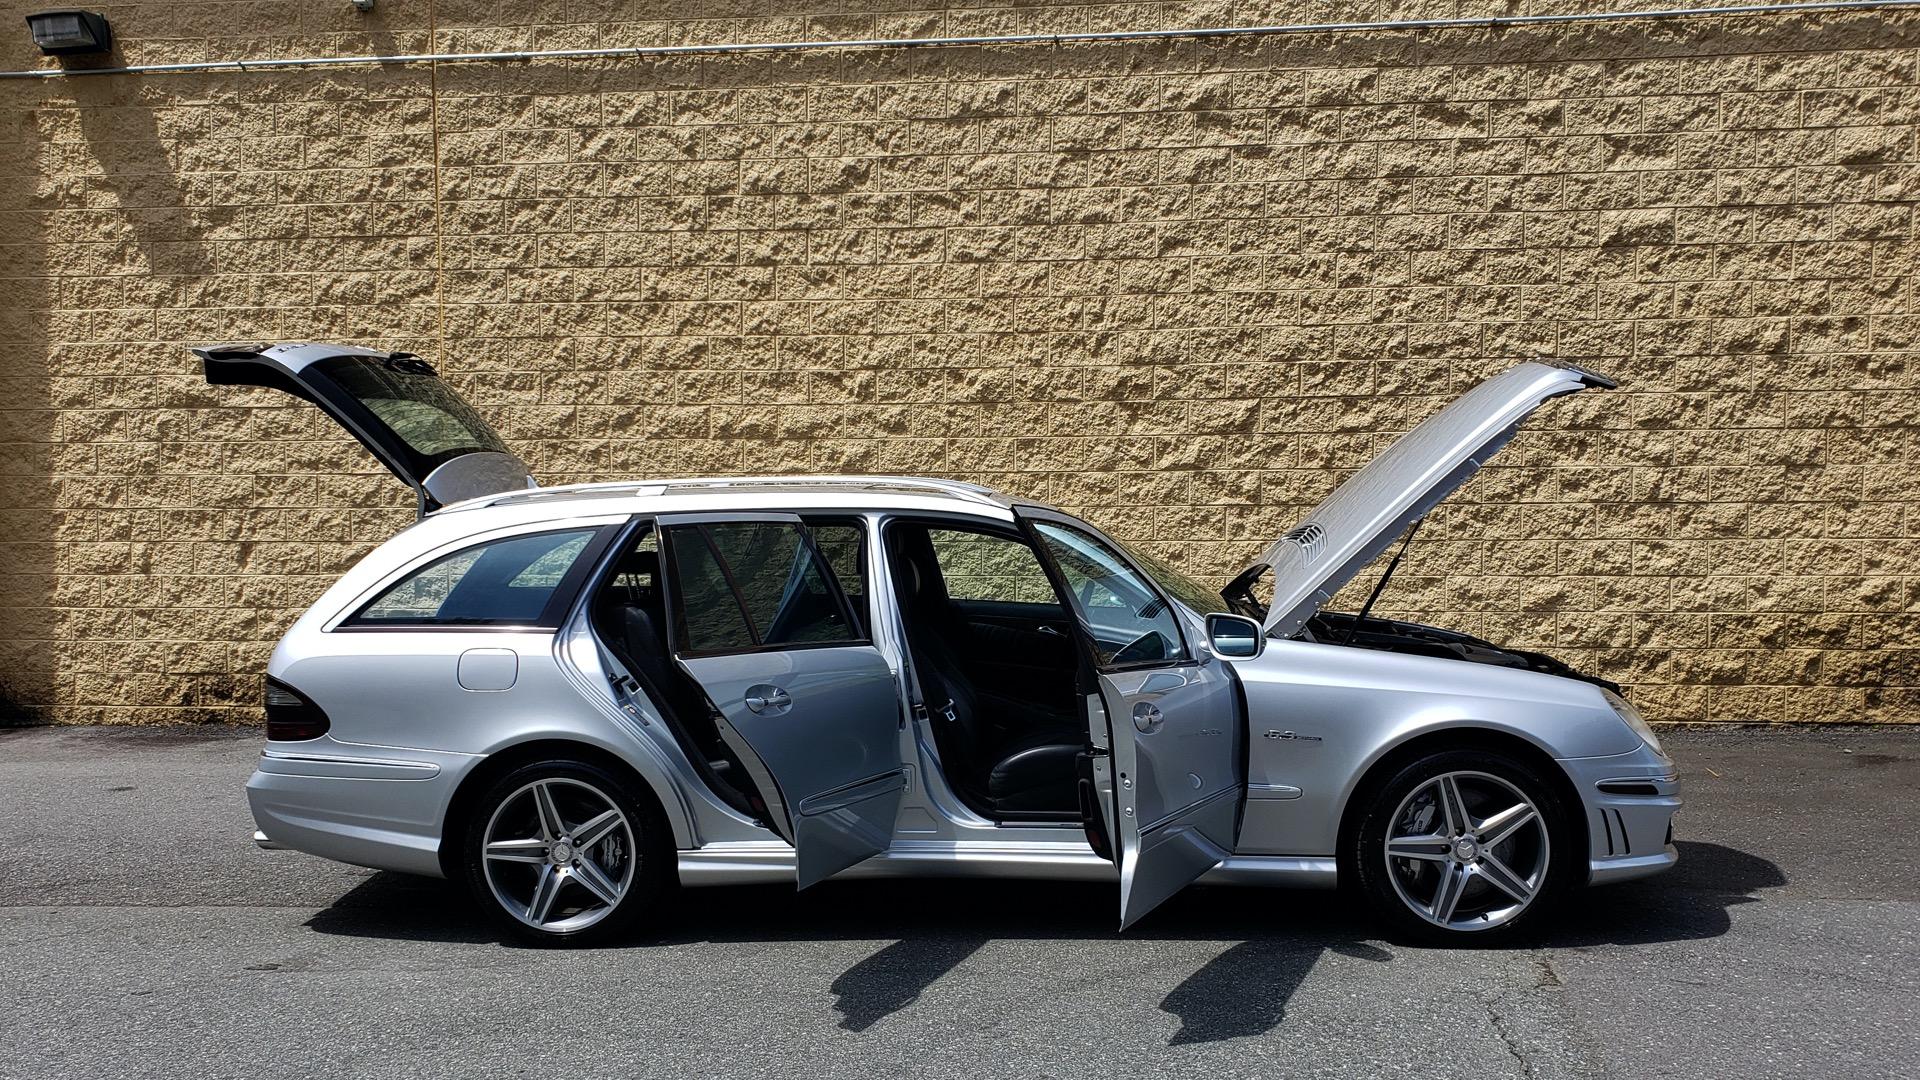 Used 2007 Mercedes-Benz E-Class E63 AMG WAGON / NAV / SUNROOF / HARMAN/KARDON for sale $29,000 at Formula Imports in Charlotte NC 28227 10